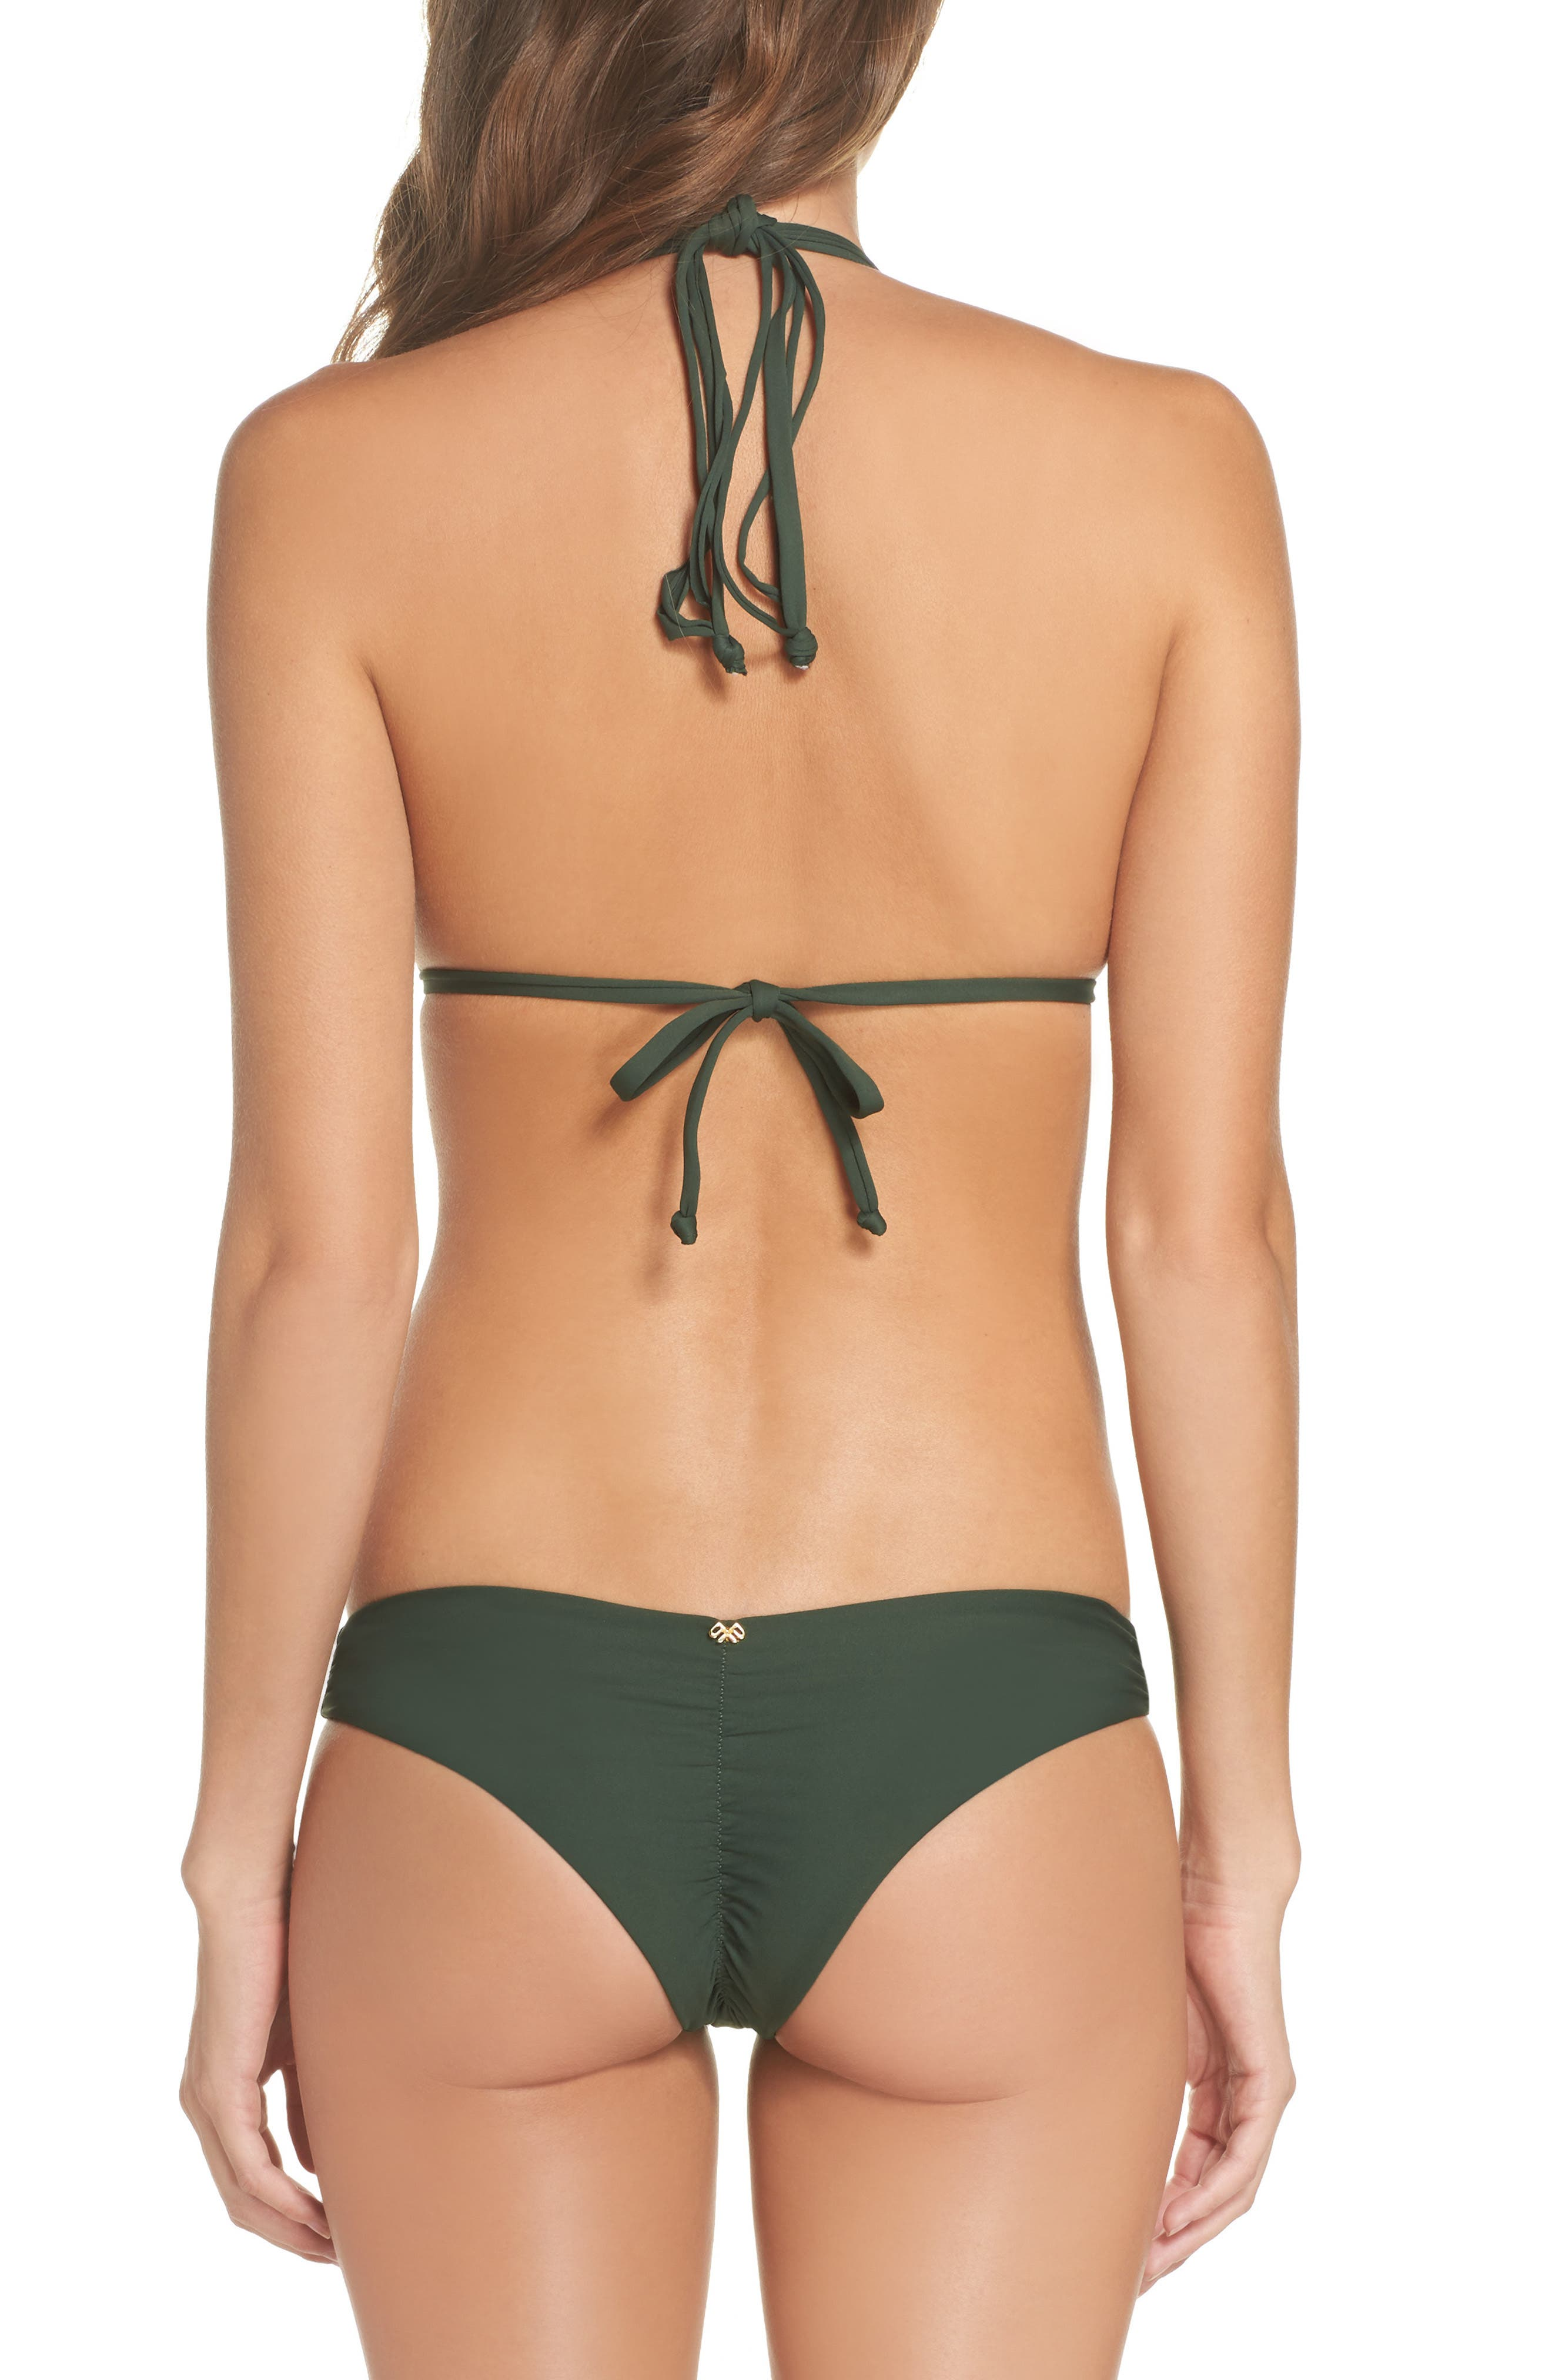 Isla Macramé Bikini Top,                             Alternate thumbnail 8, color,                             ARMY